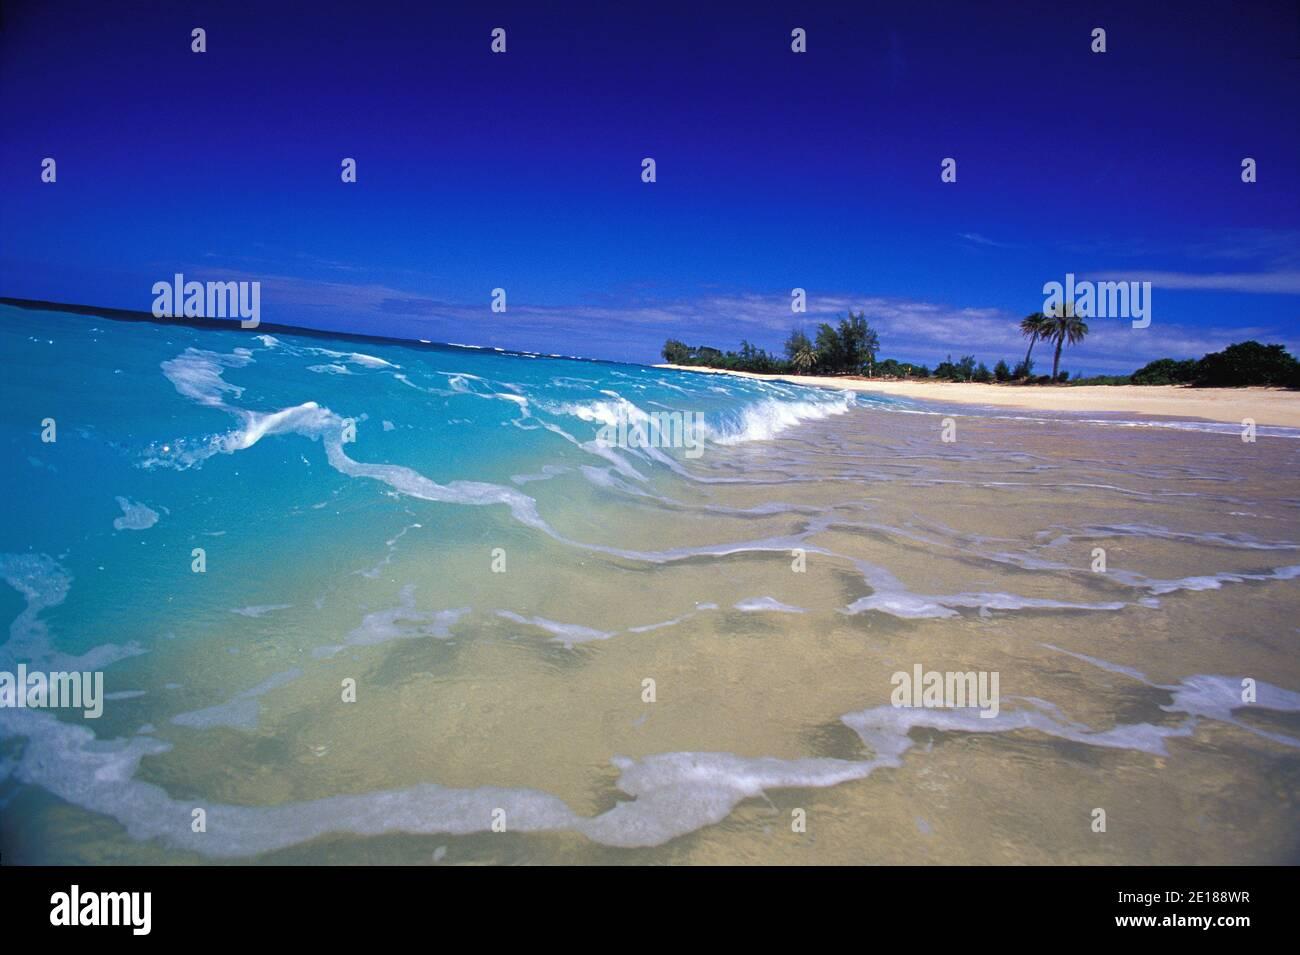 Waves breaking in clear blue water on white sand beach, Velzyland, North Shore, Oahu Foto de stock